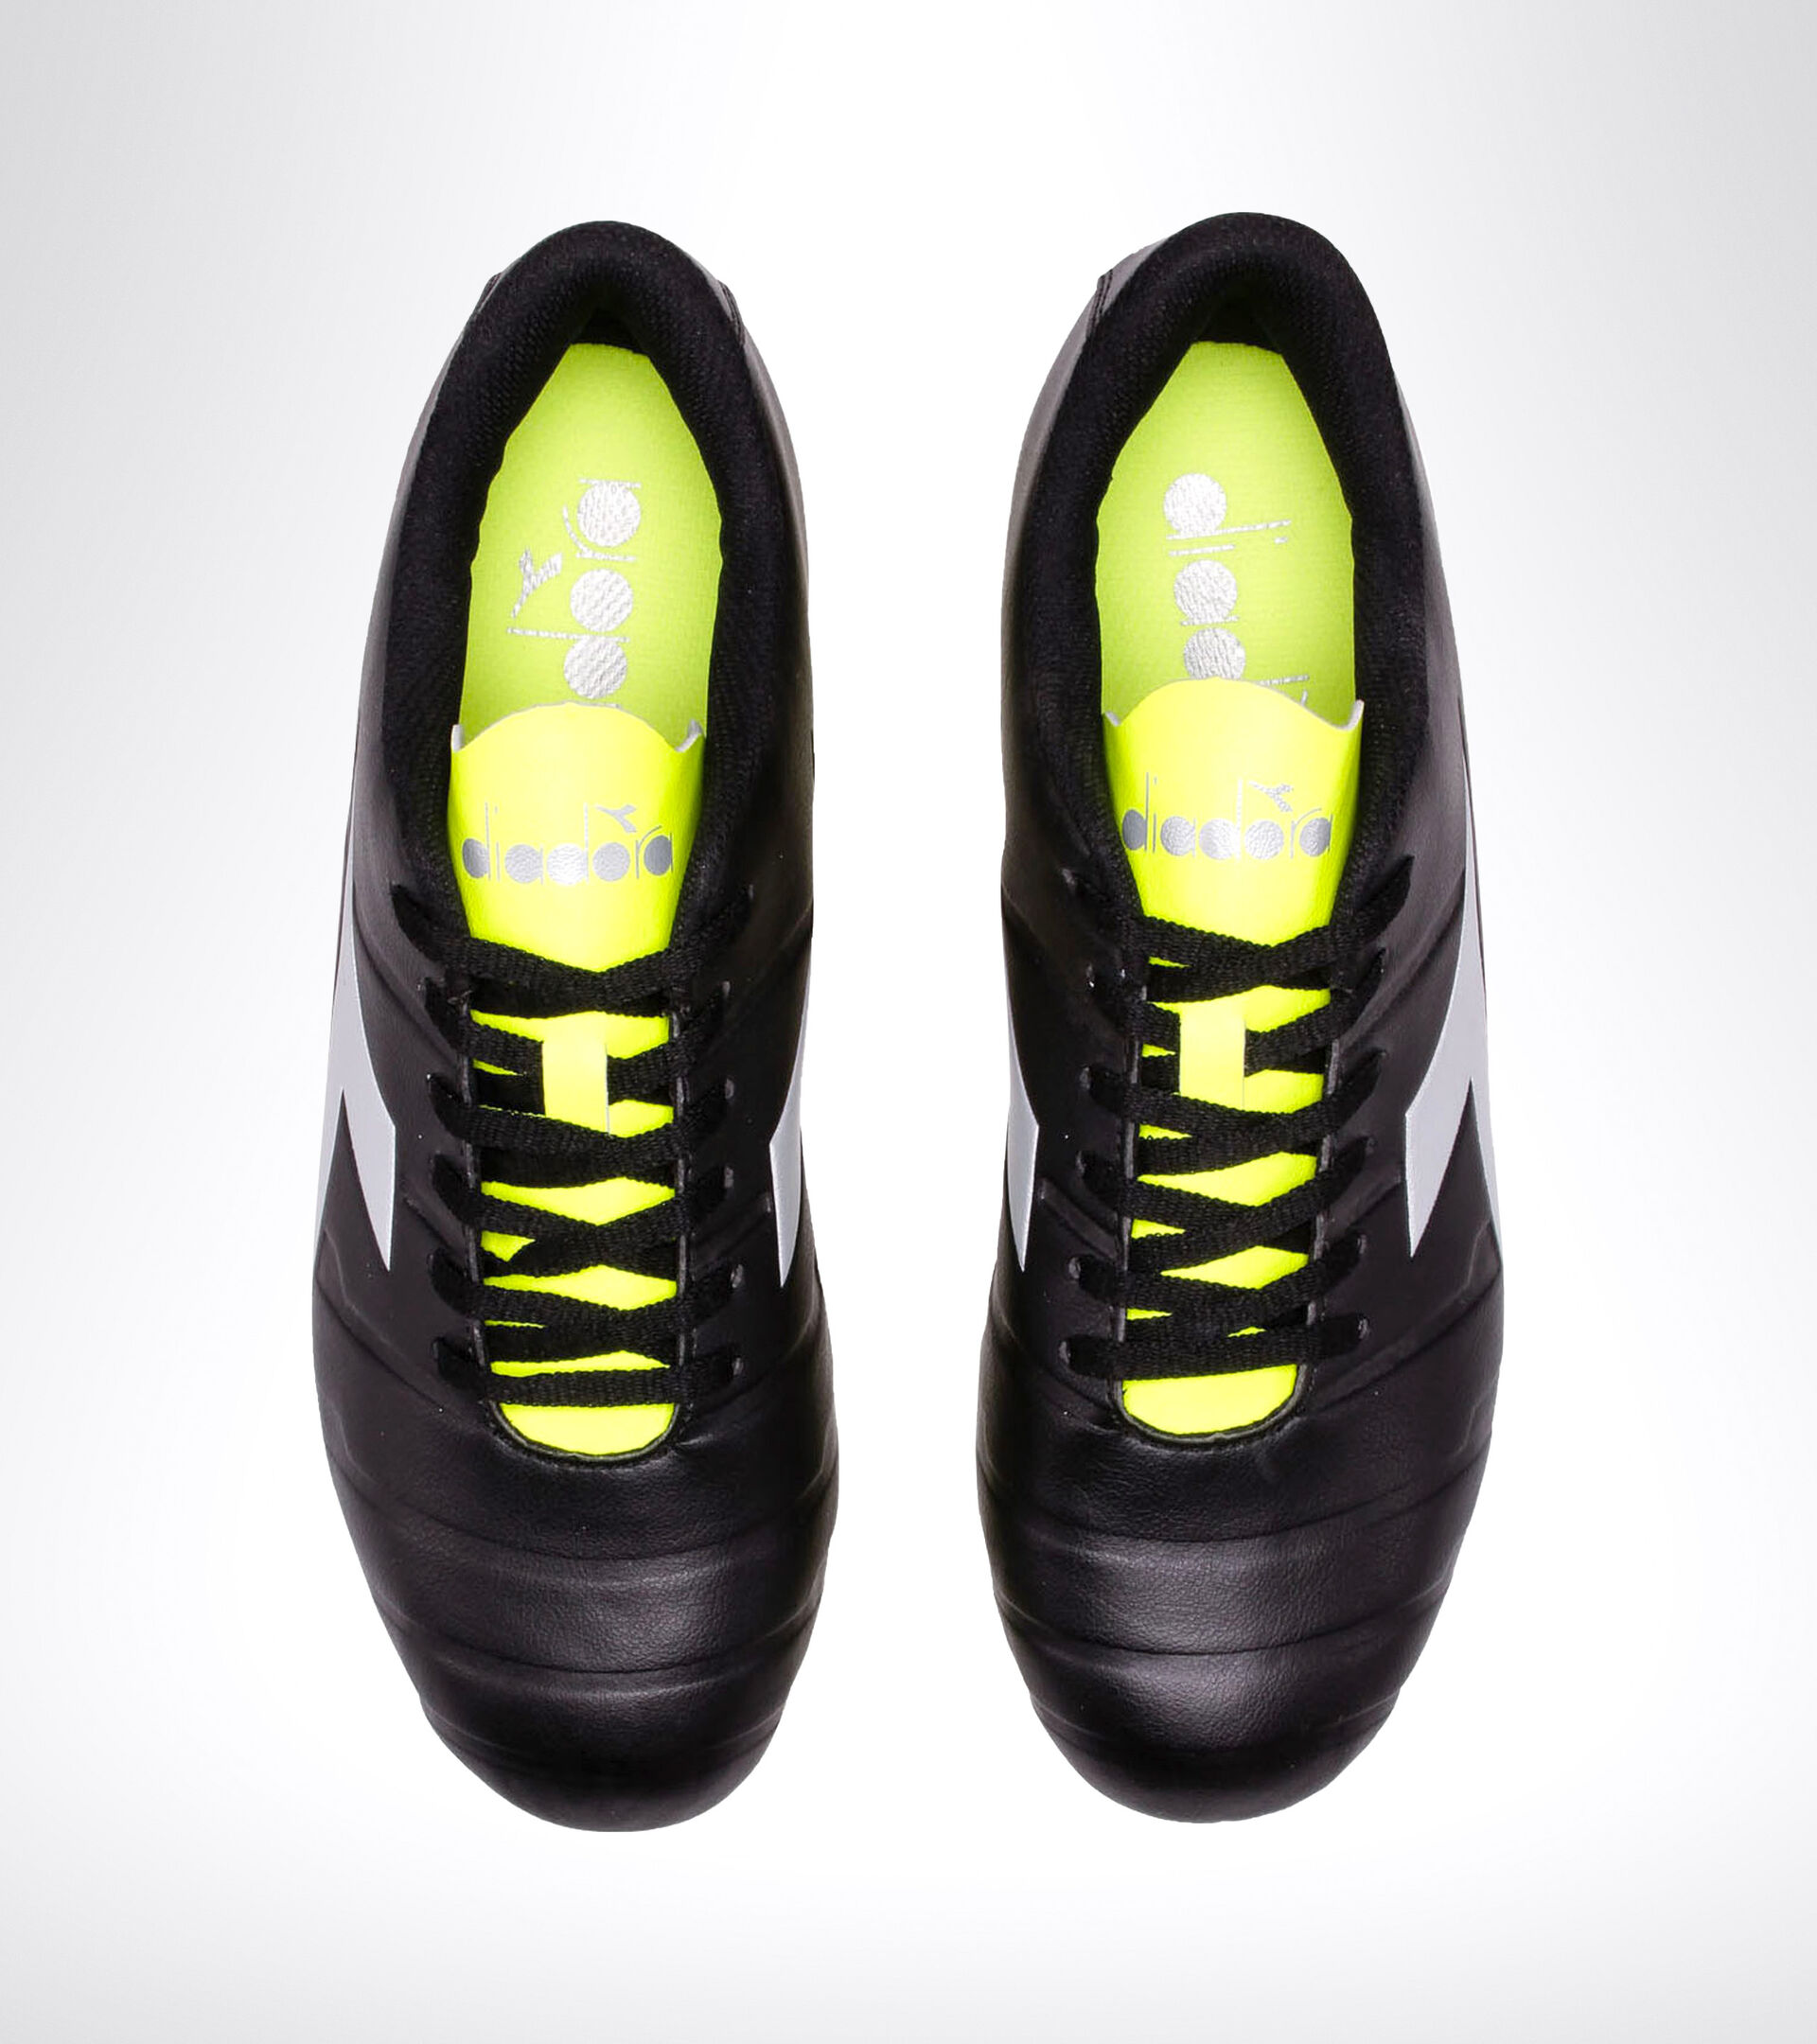 Firm ground football boot PICHICHI 3 MG14 BLACK/YELLOW FL DD/SILVER - Diadora